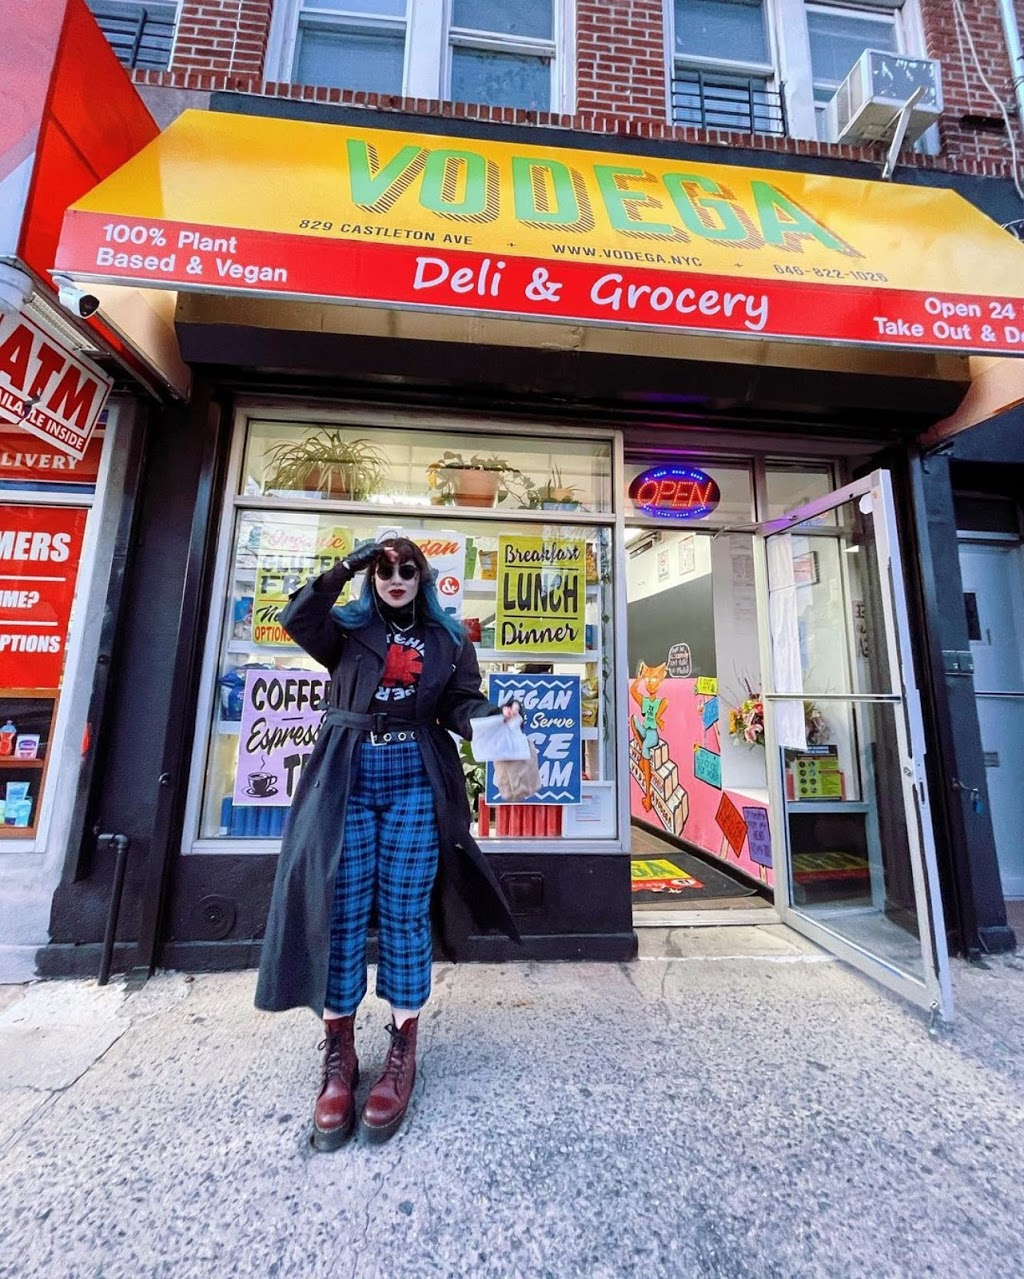 Vodega Deli & Grocery | meal delivery | 829 Castleton Ave, Staten Island, NY 10310, USA | 6468221026 OR +1 646-822-1026